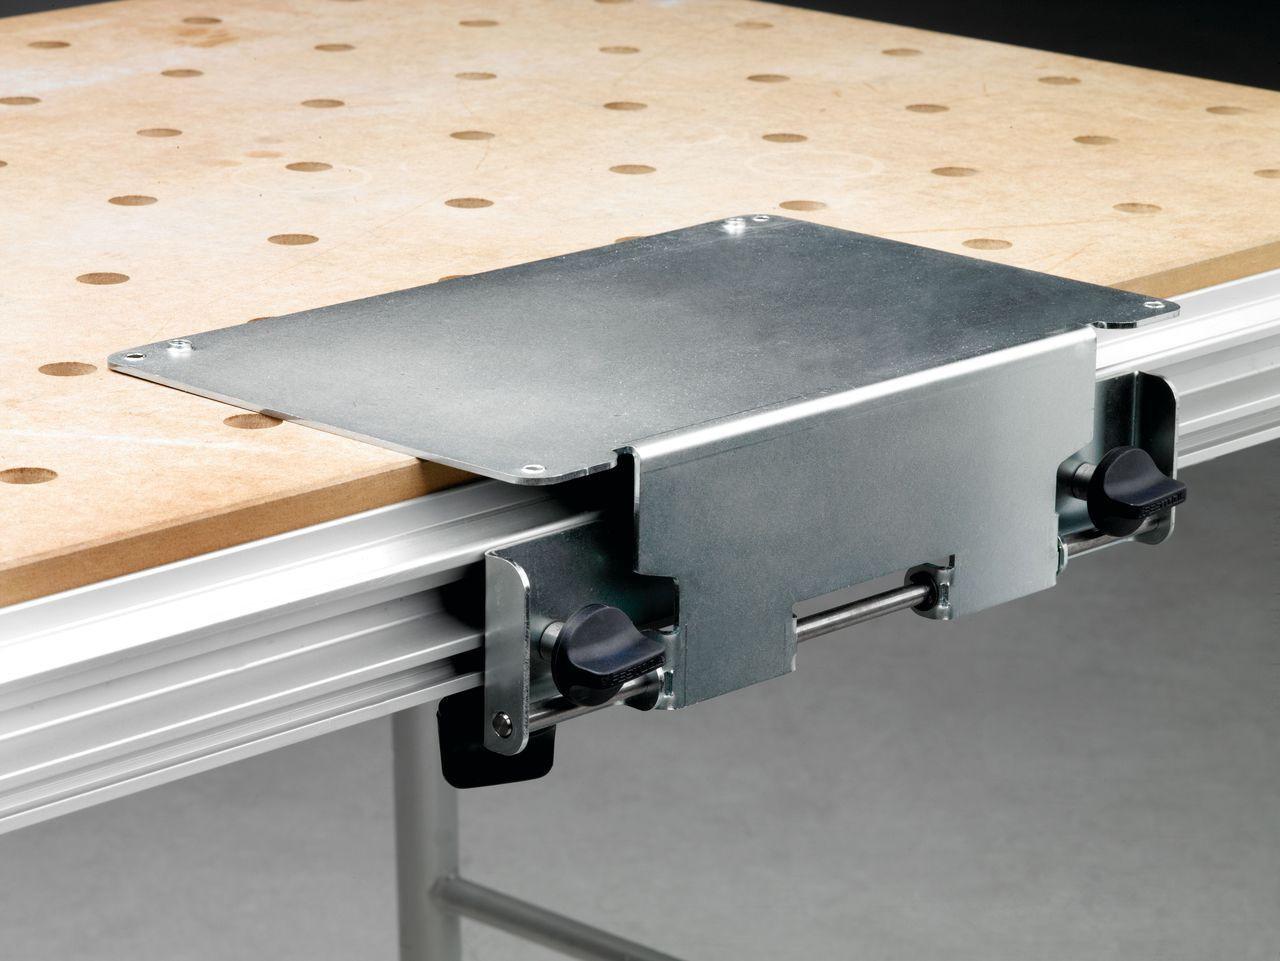 festool vac sys mft clamp 494977. Black Bedroom Furniture Sets. Home Design Ideas